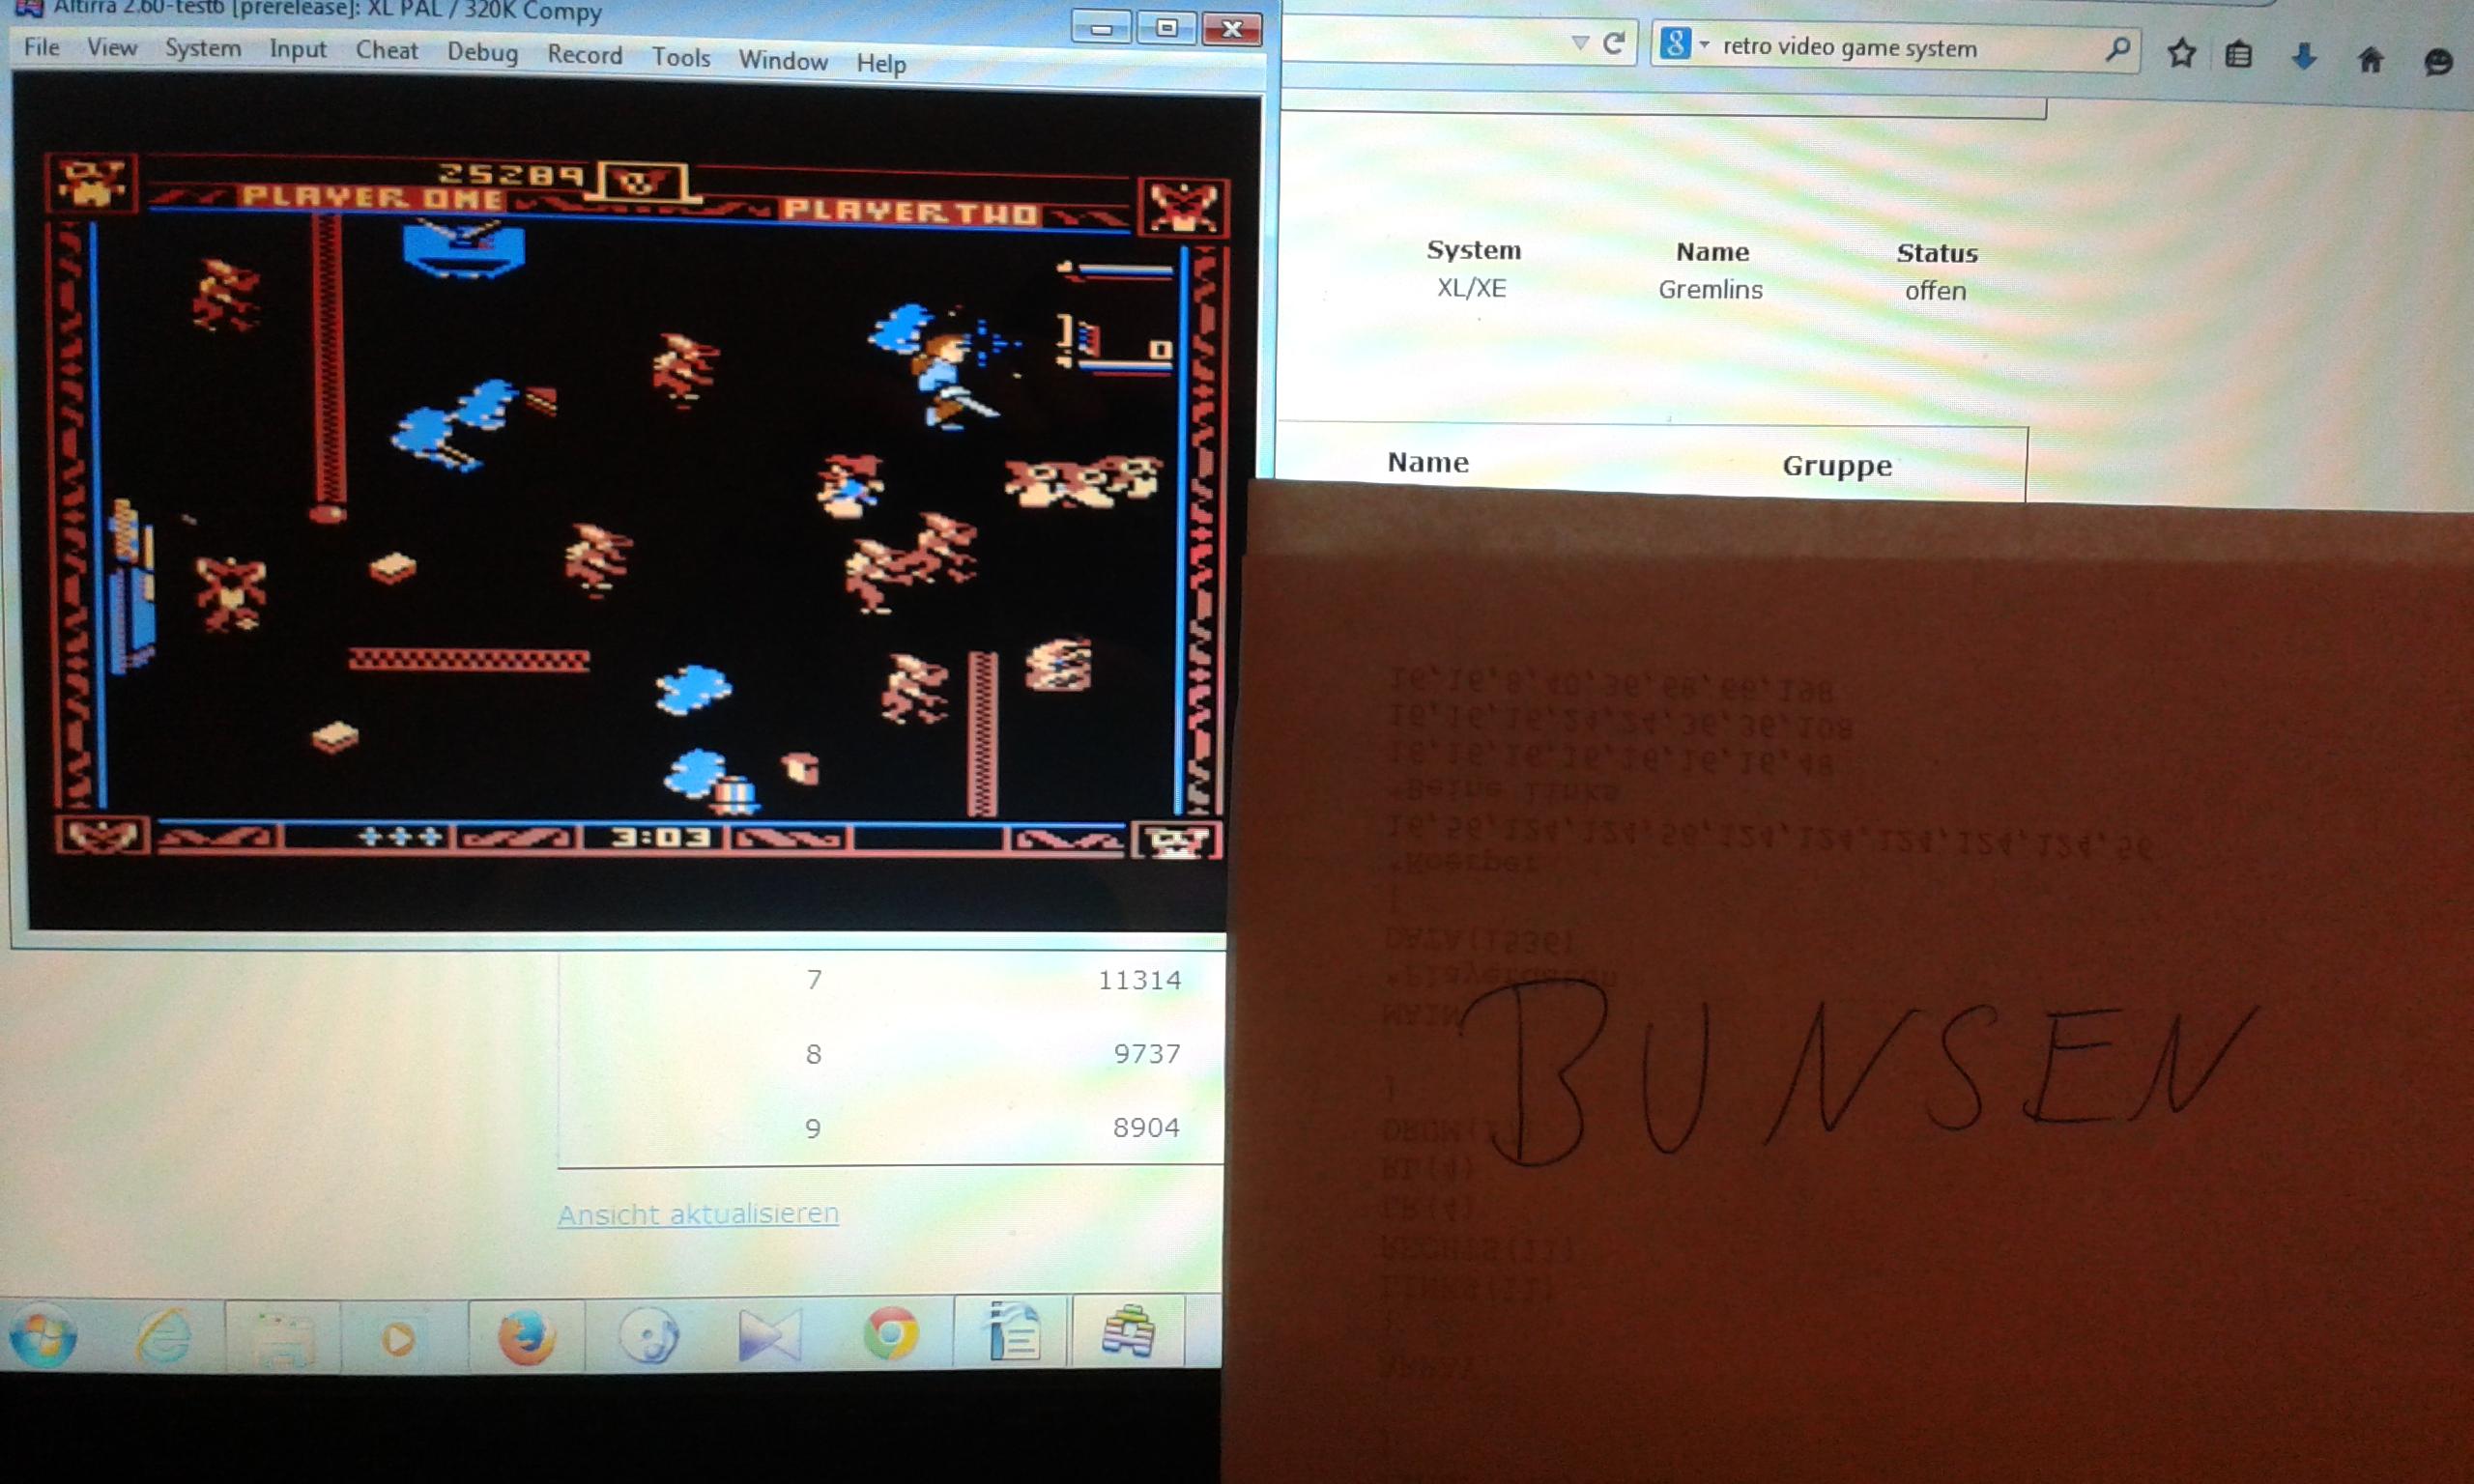 Bunsen: Gremlins (Atari 400/800/XL/XE Emulated) 25,289 points on 2015-02-25 15:03:05